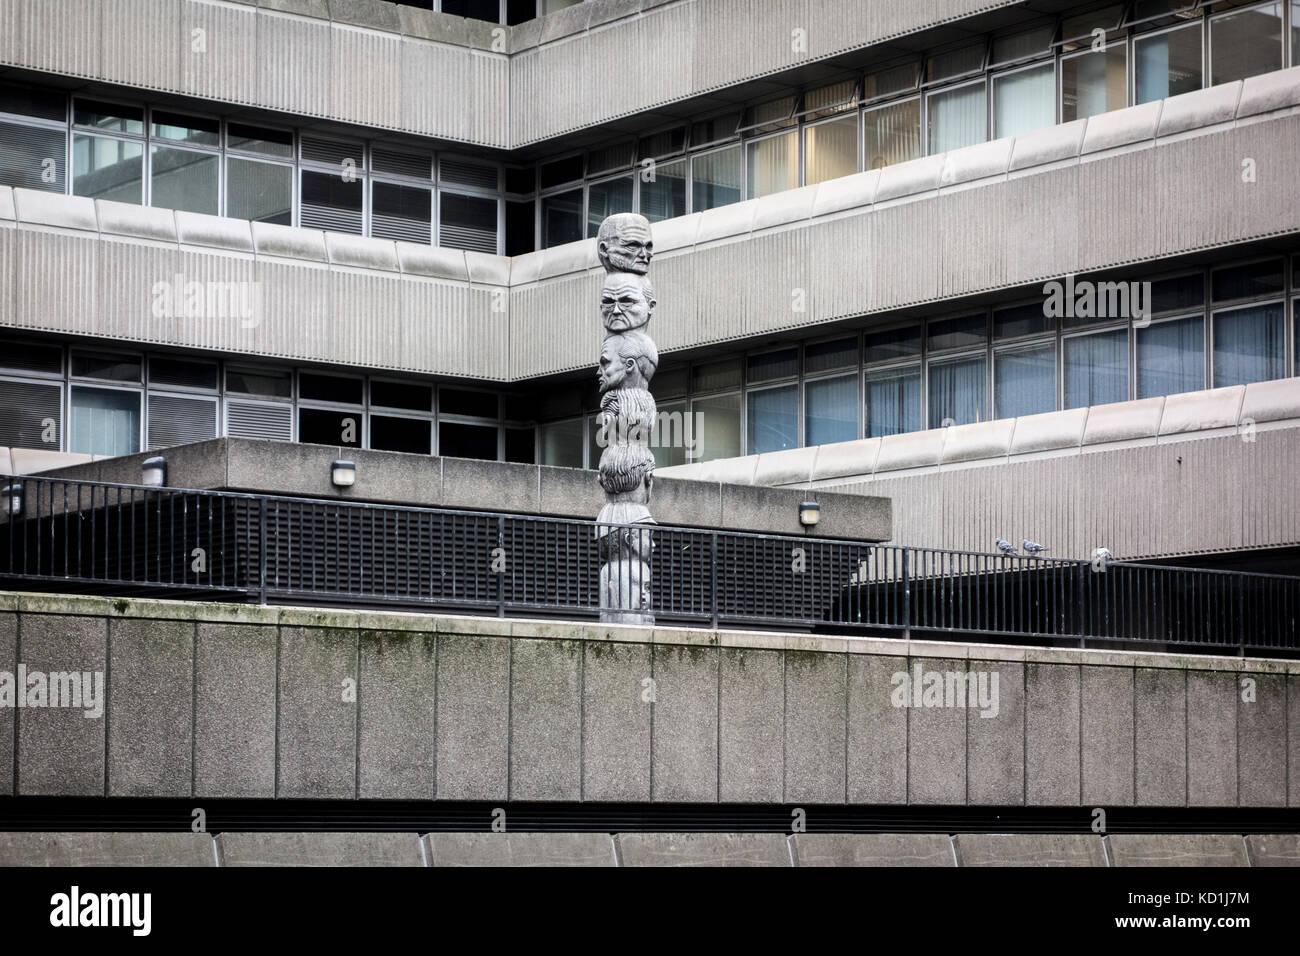 Seven Ages of Man by Richard Kindersley 1980 at Baynard House, brutalist office building, London, UK - Stock Image